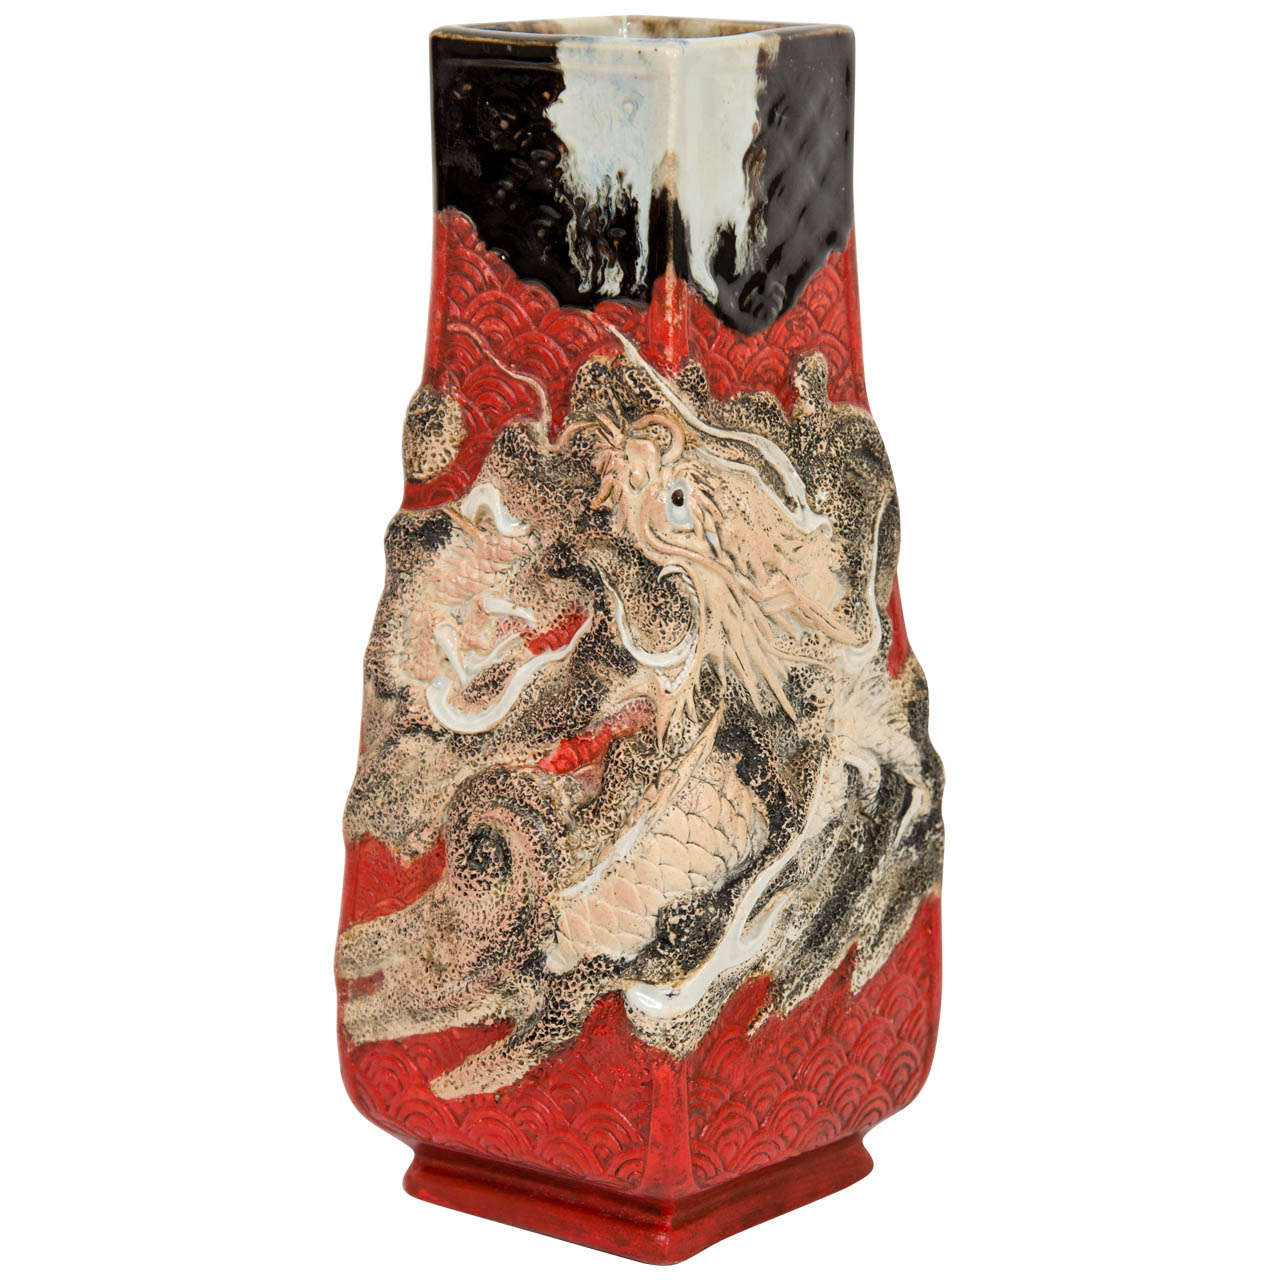 A vintage ceramic japanese vase with raised dragon for sale at 1stdibs a vintage ceramic japanese vase with raised dragon for sale reviewsmspy